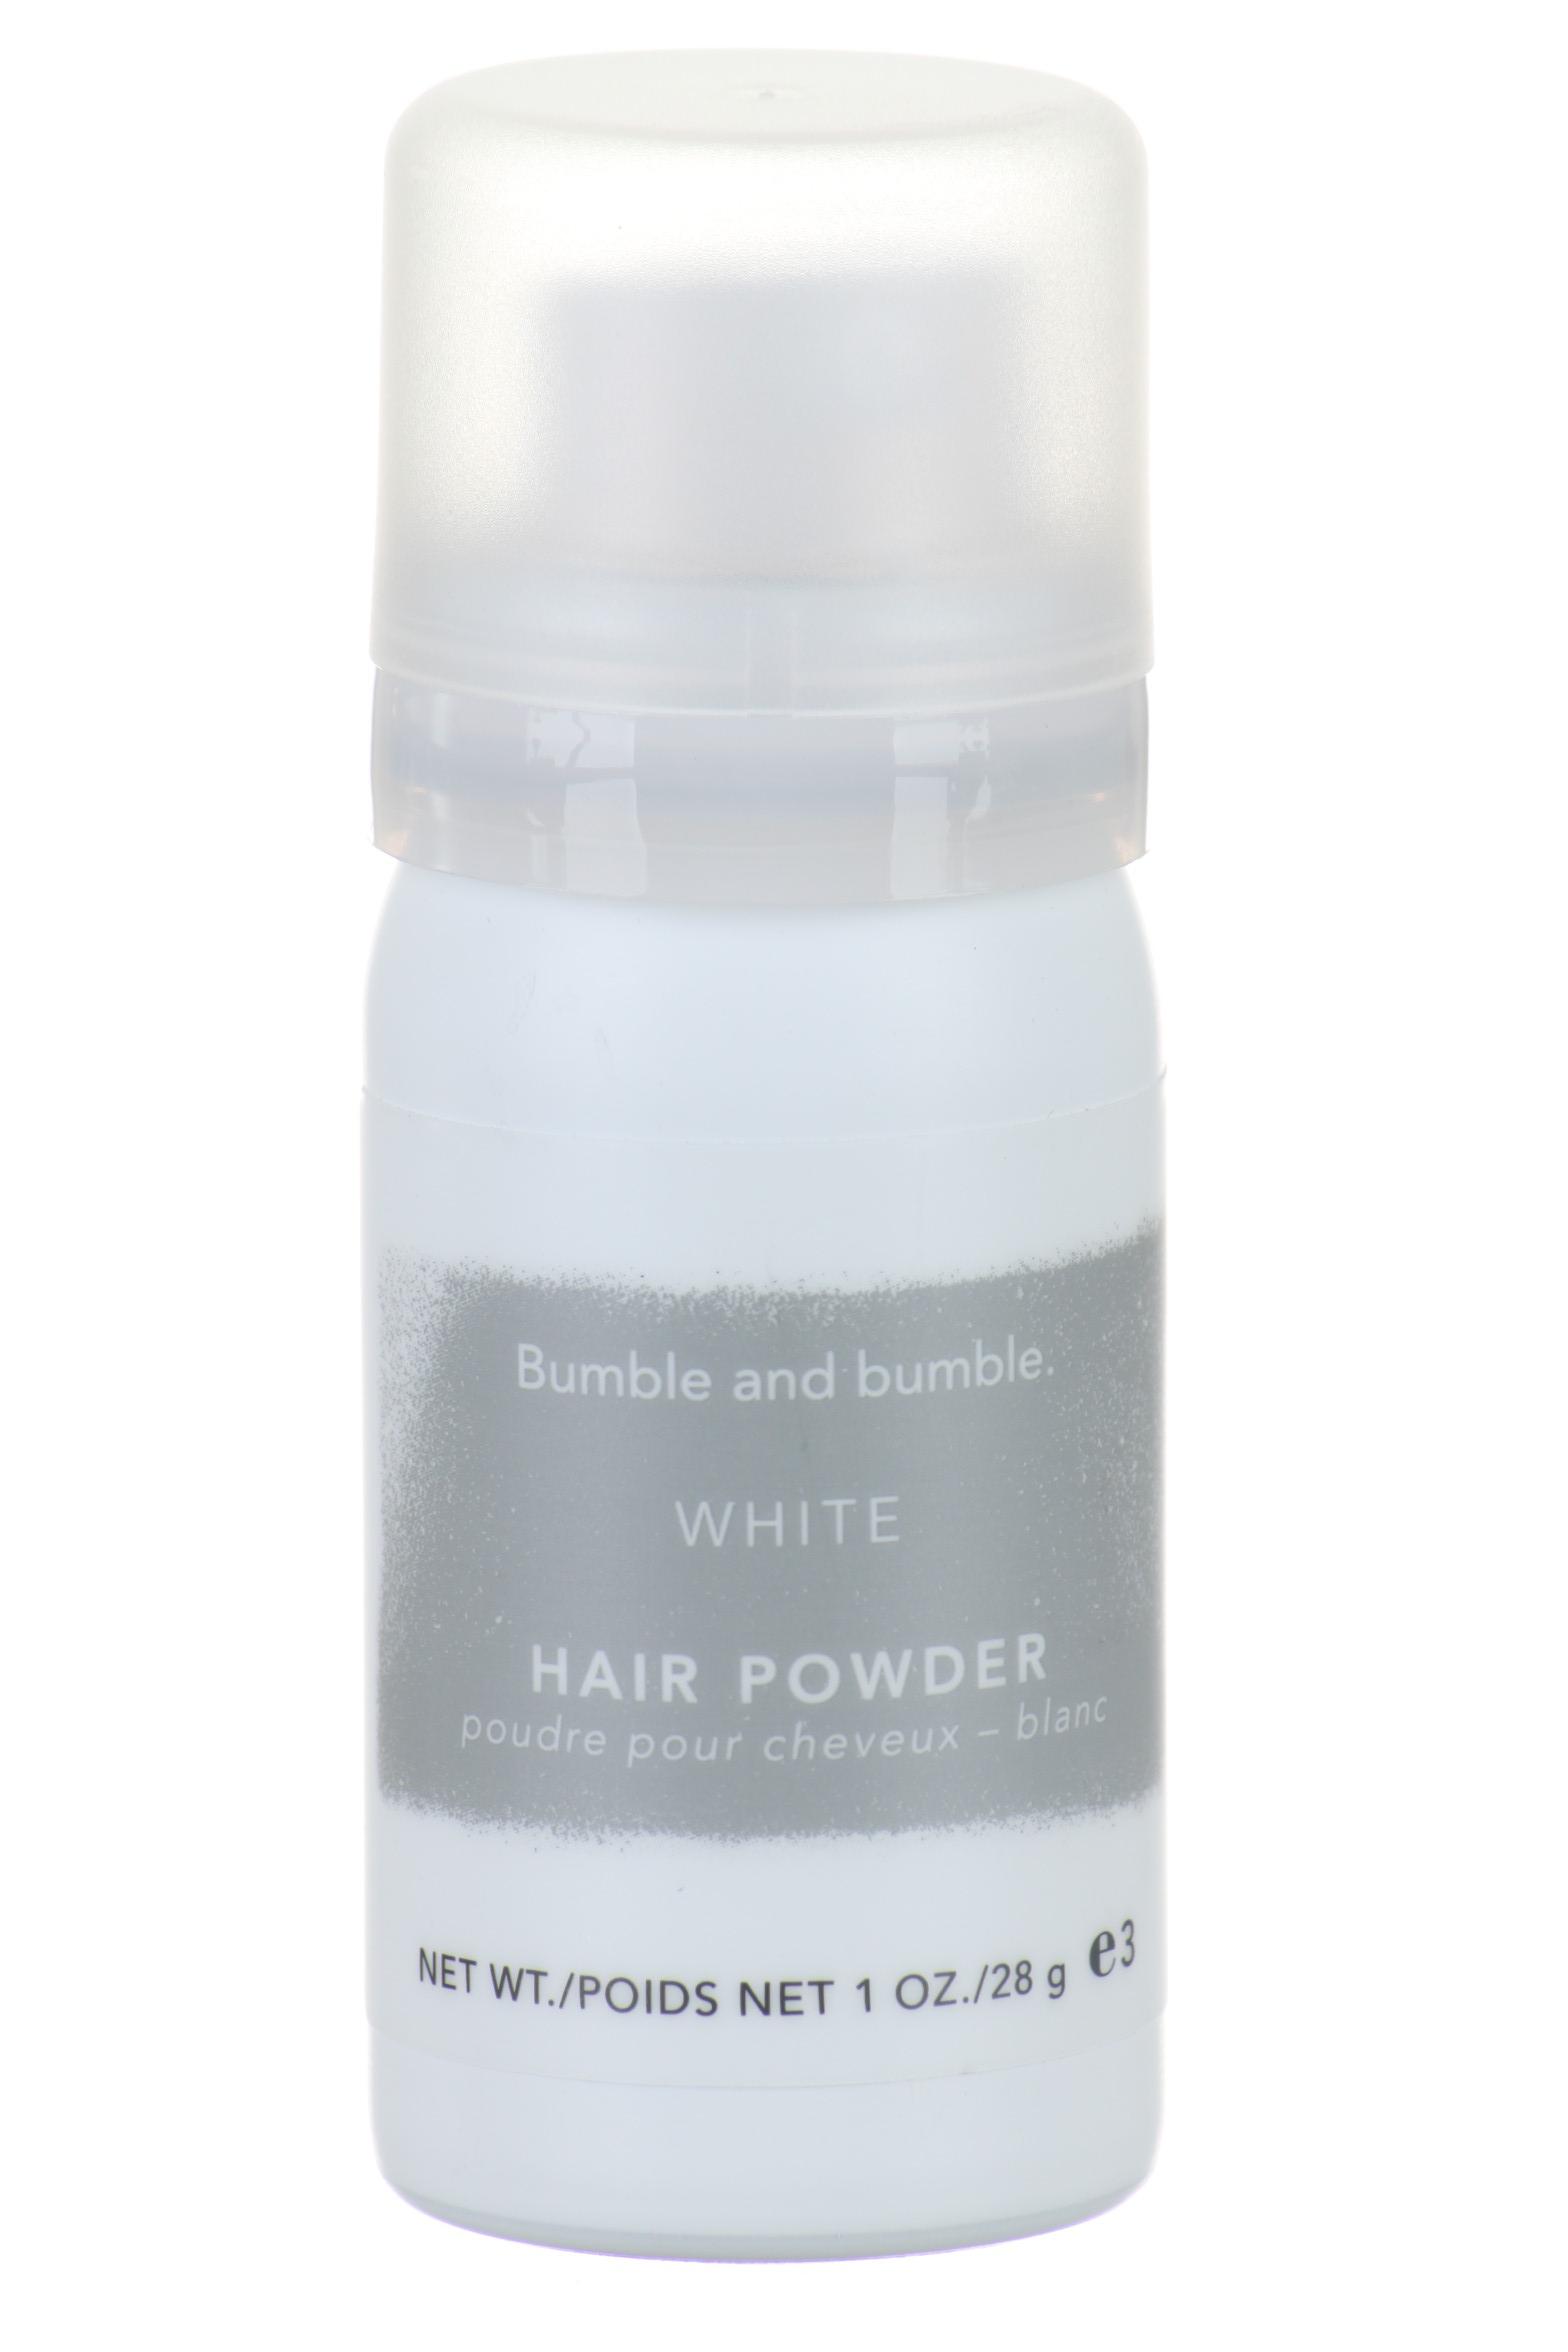 bumble and bumble white hair powder spray 1 oz ebay. Black Bedroom Furniture Sets. Home Design Ideas